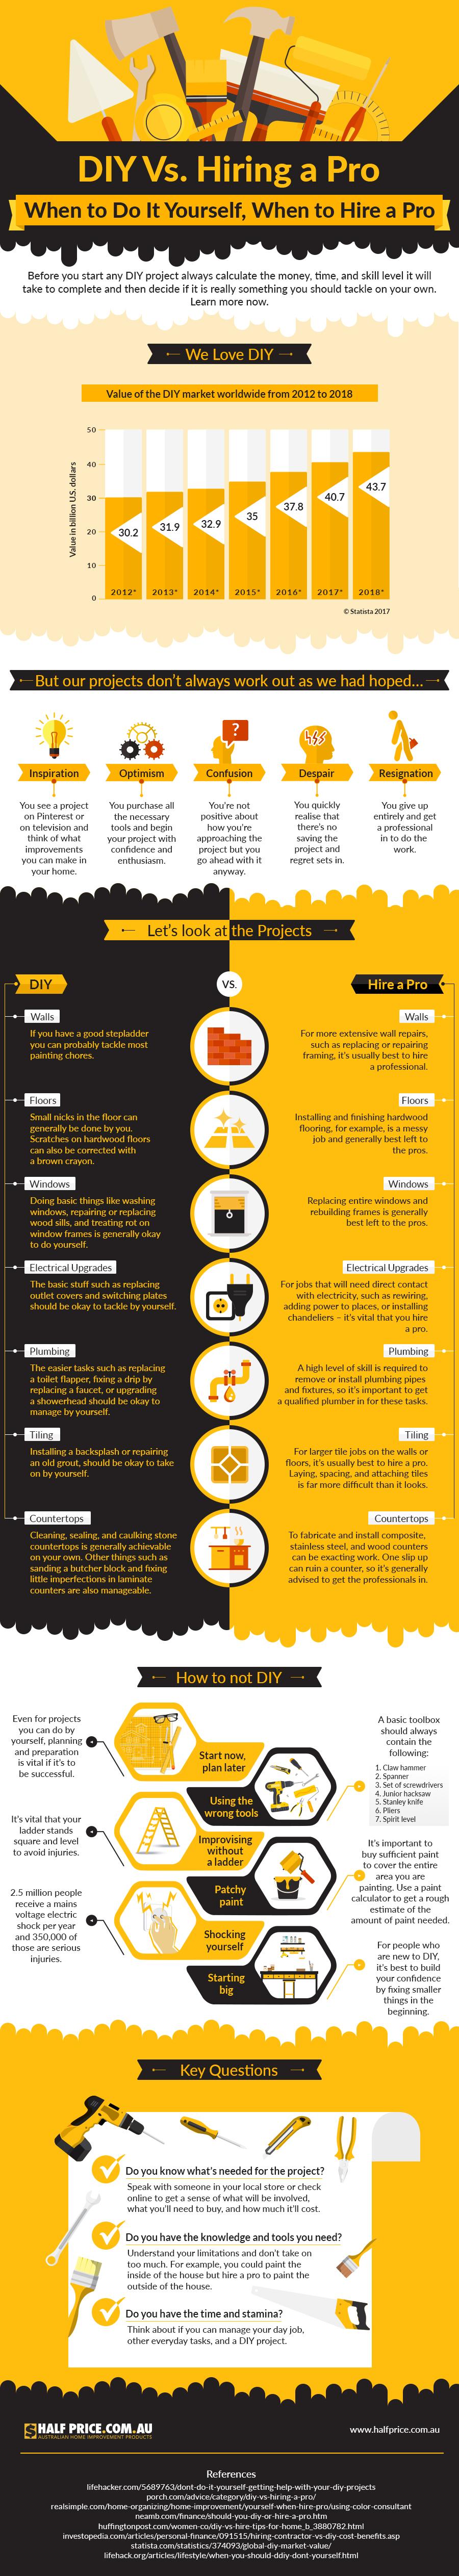 DIY Vs Hiring Professionals: How to Decide - Infographic